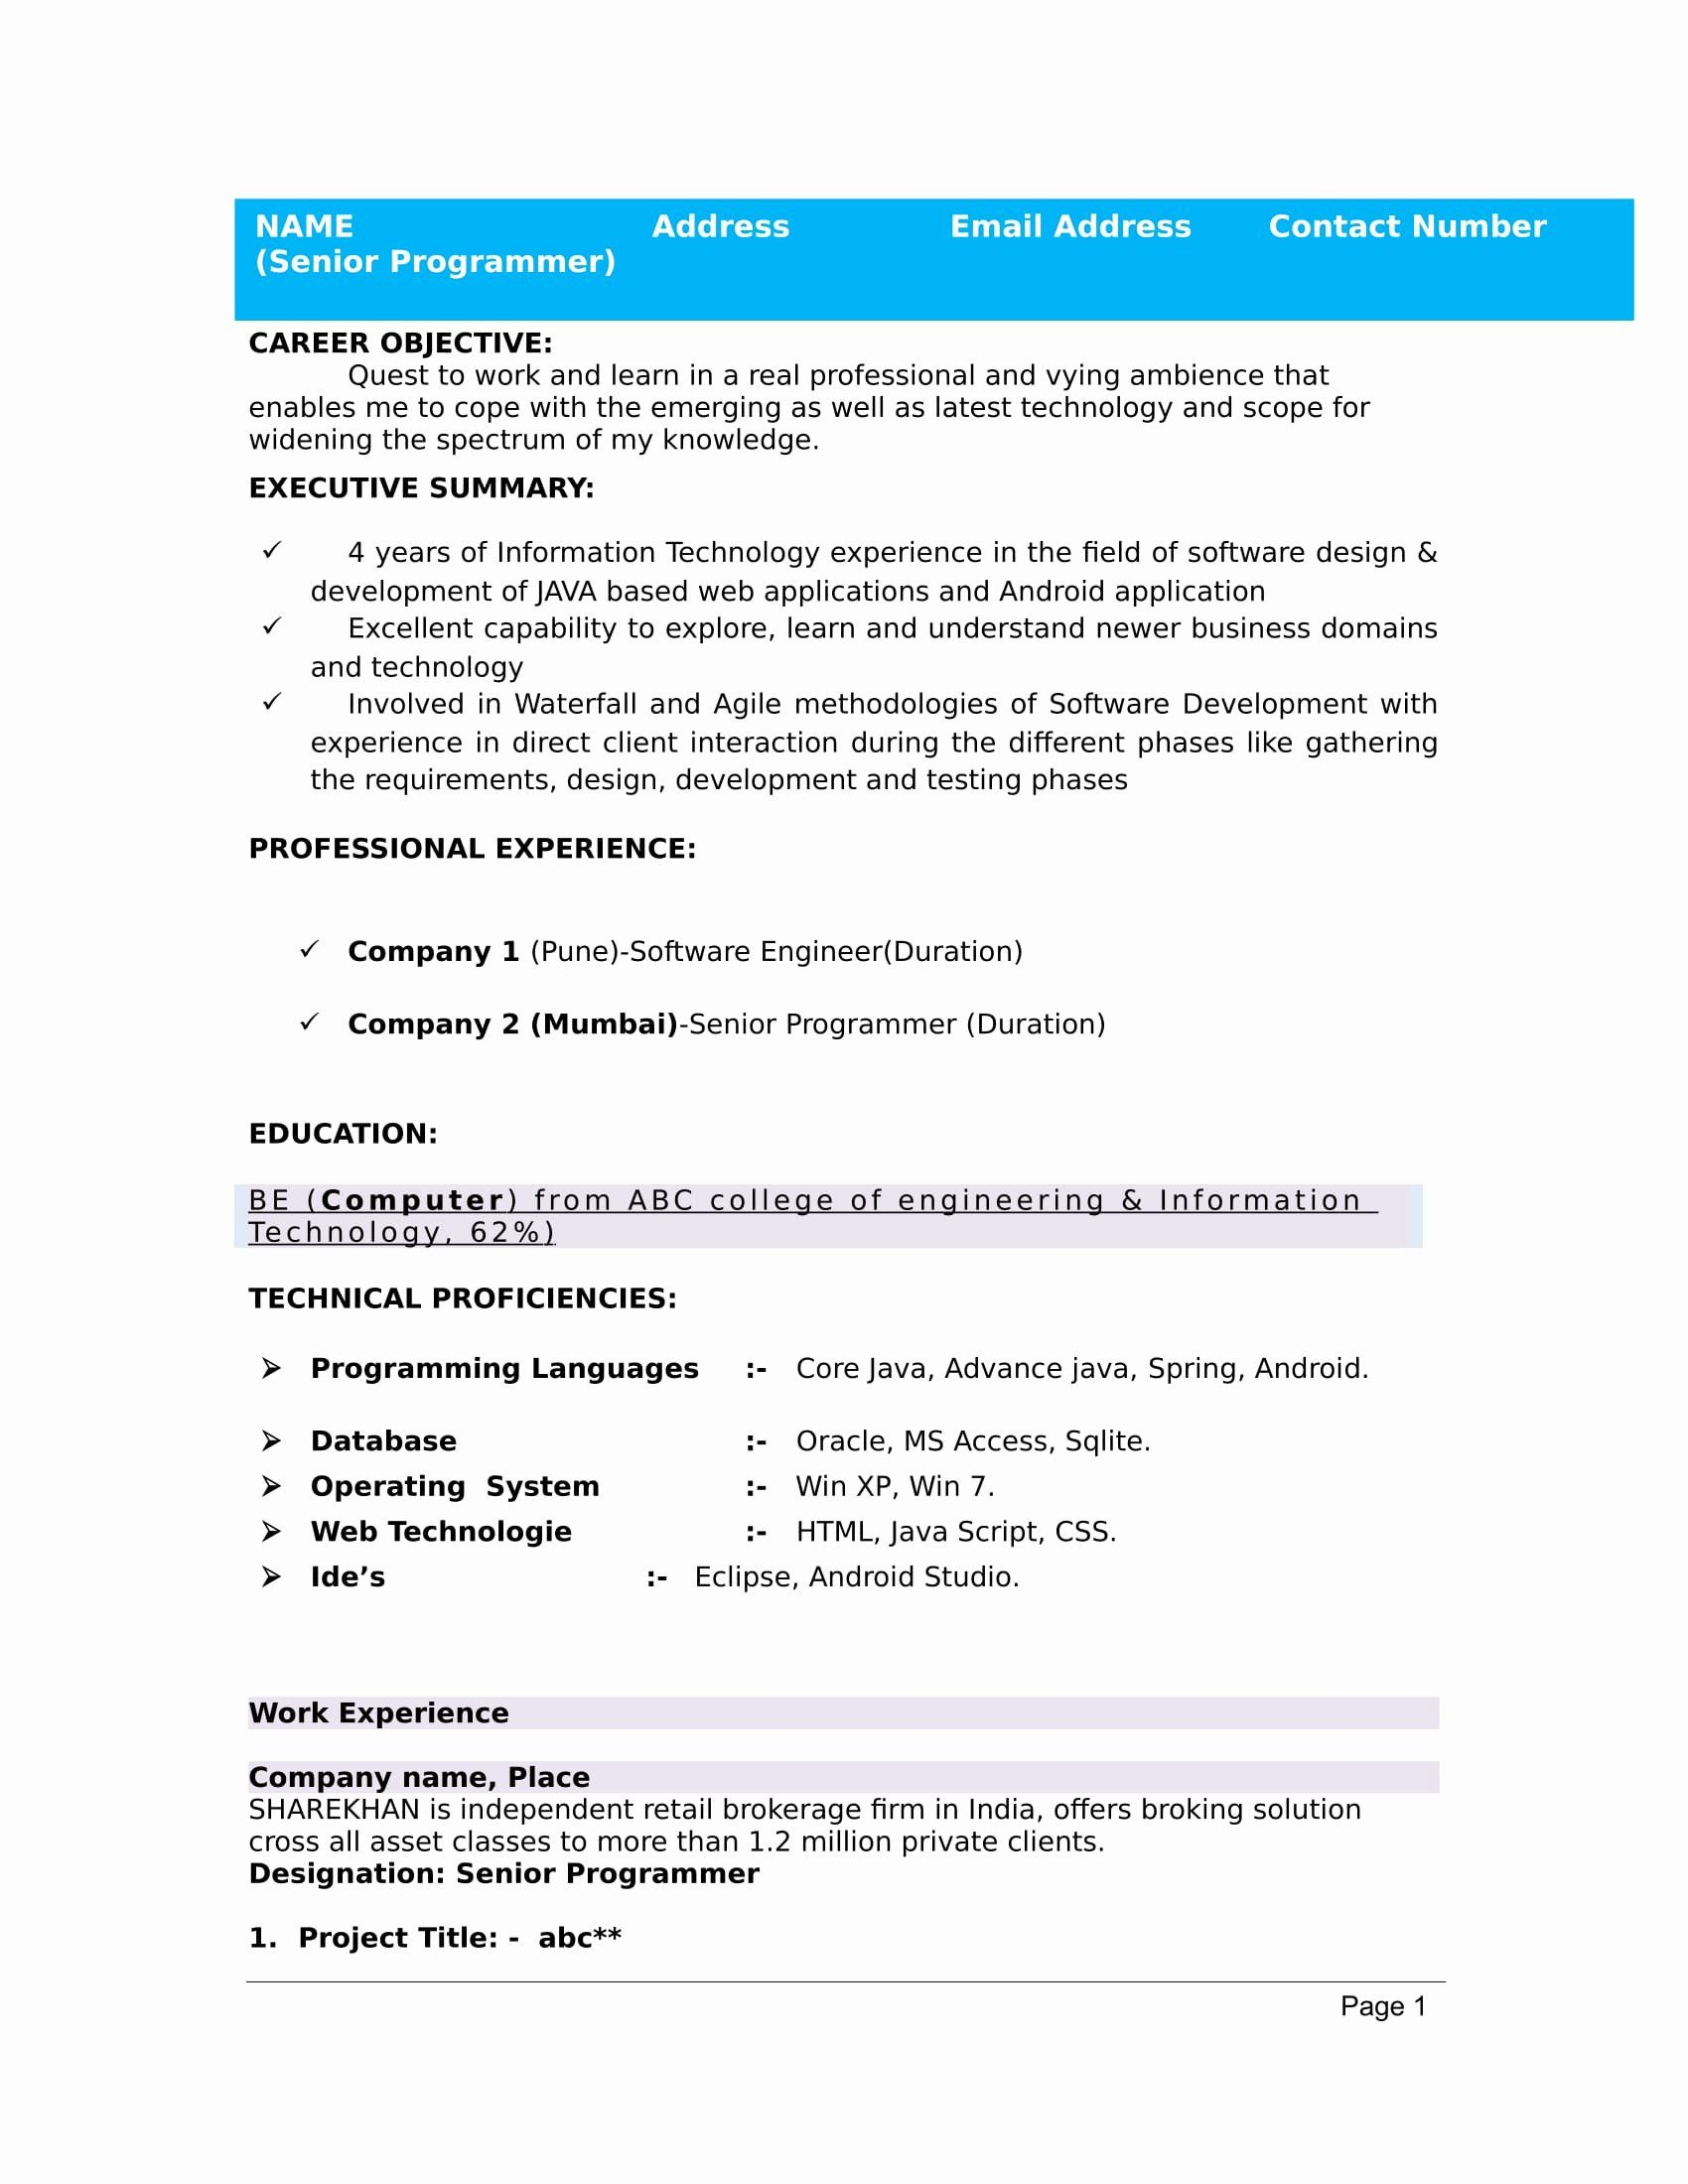 Sample Resume Templates For Freshers